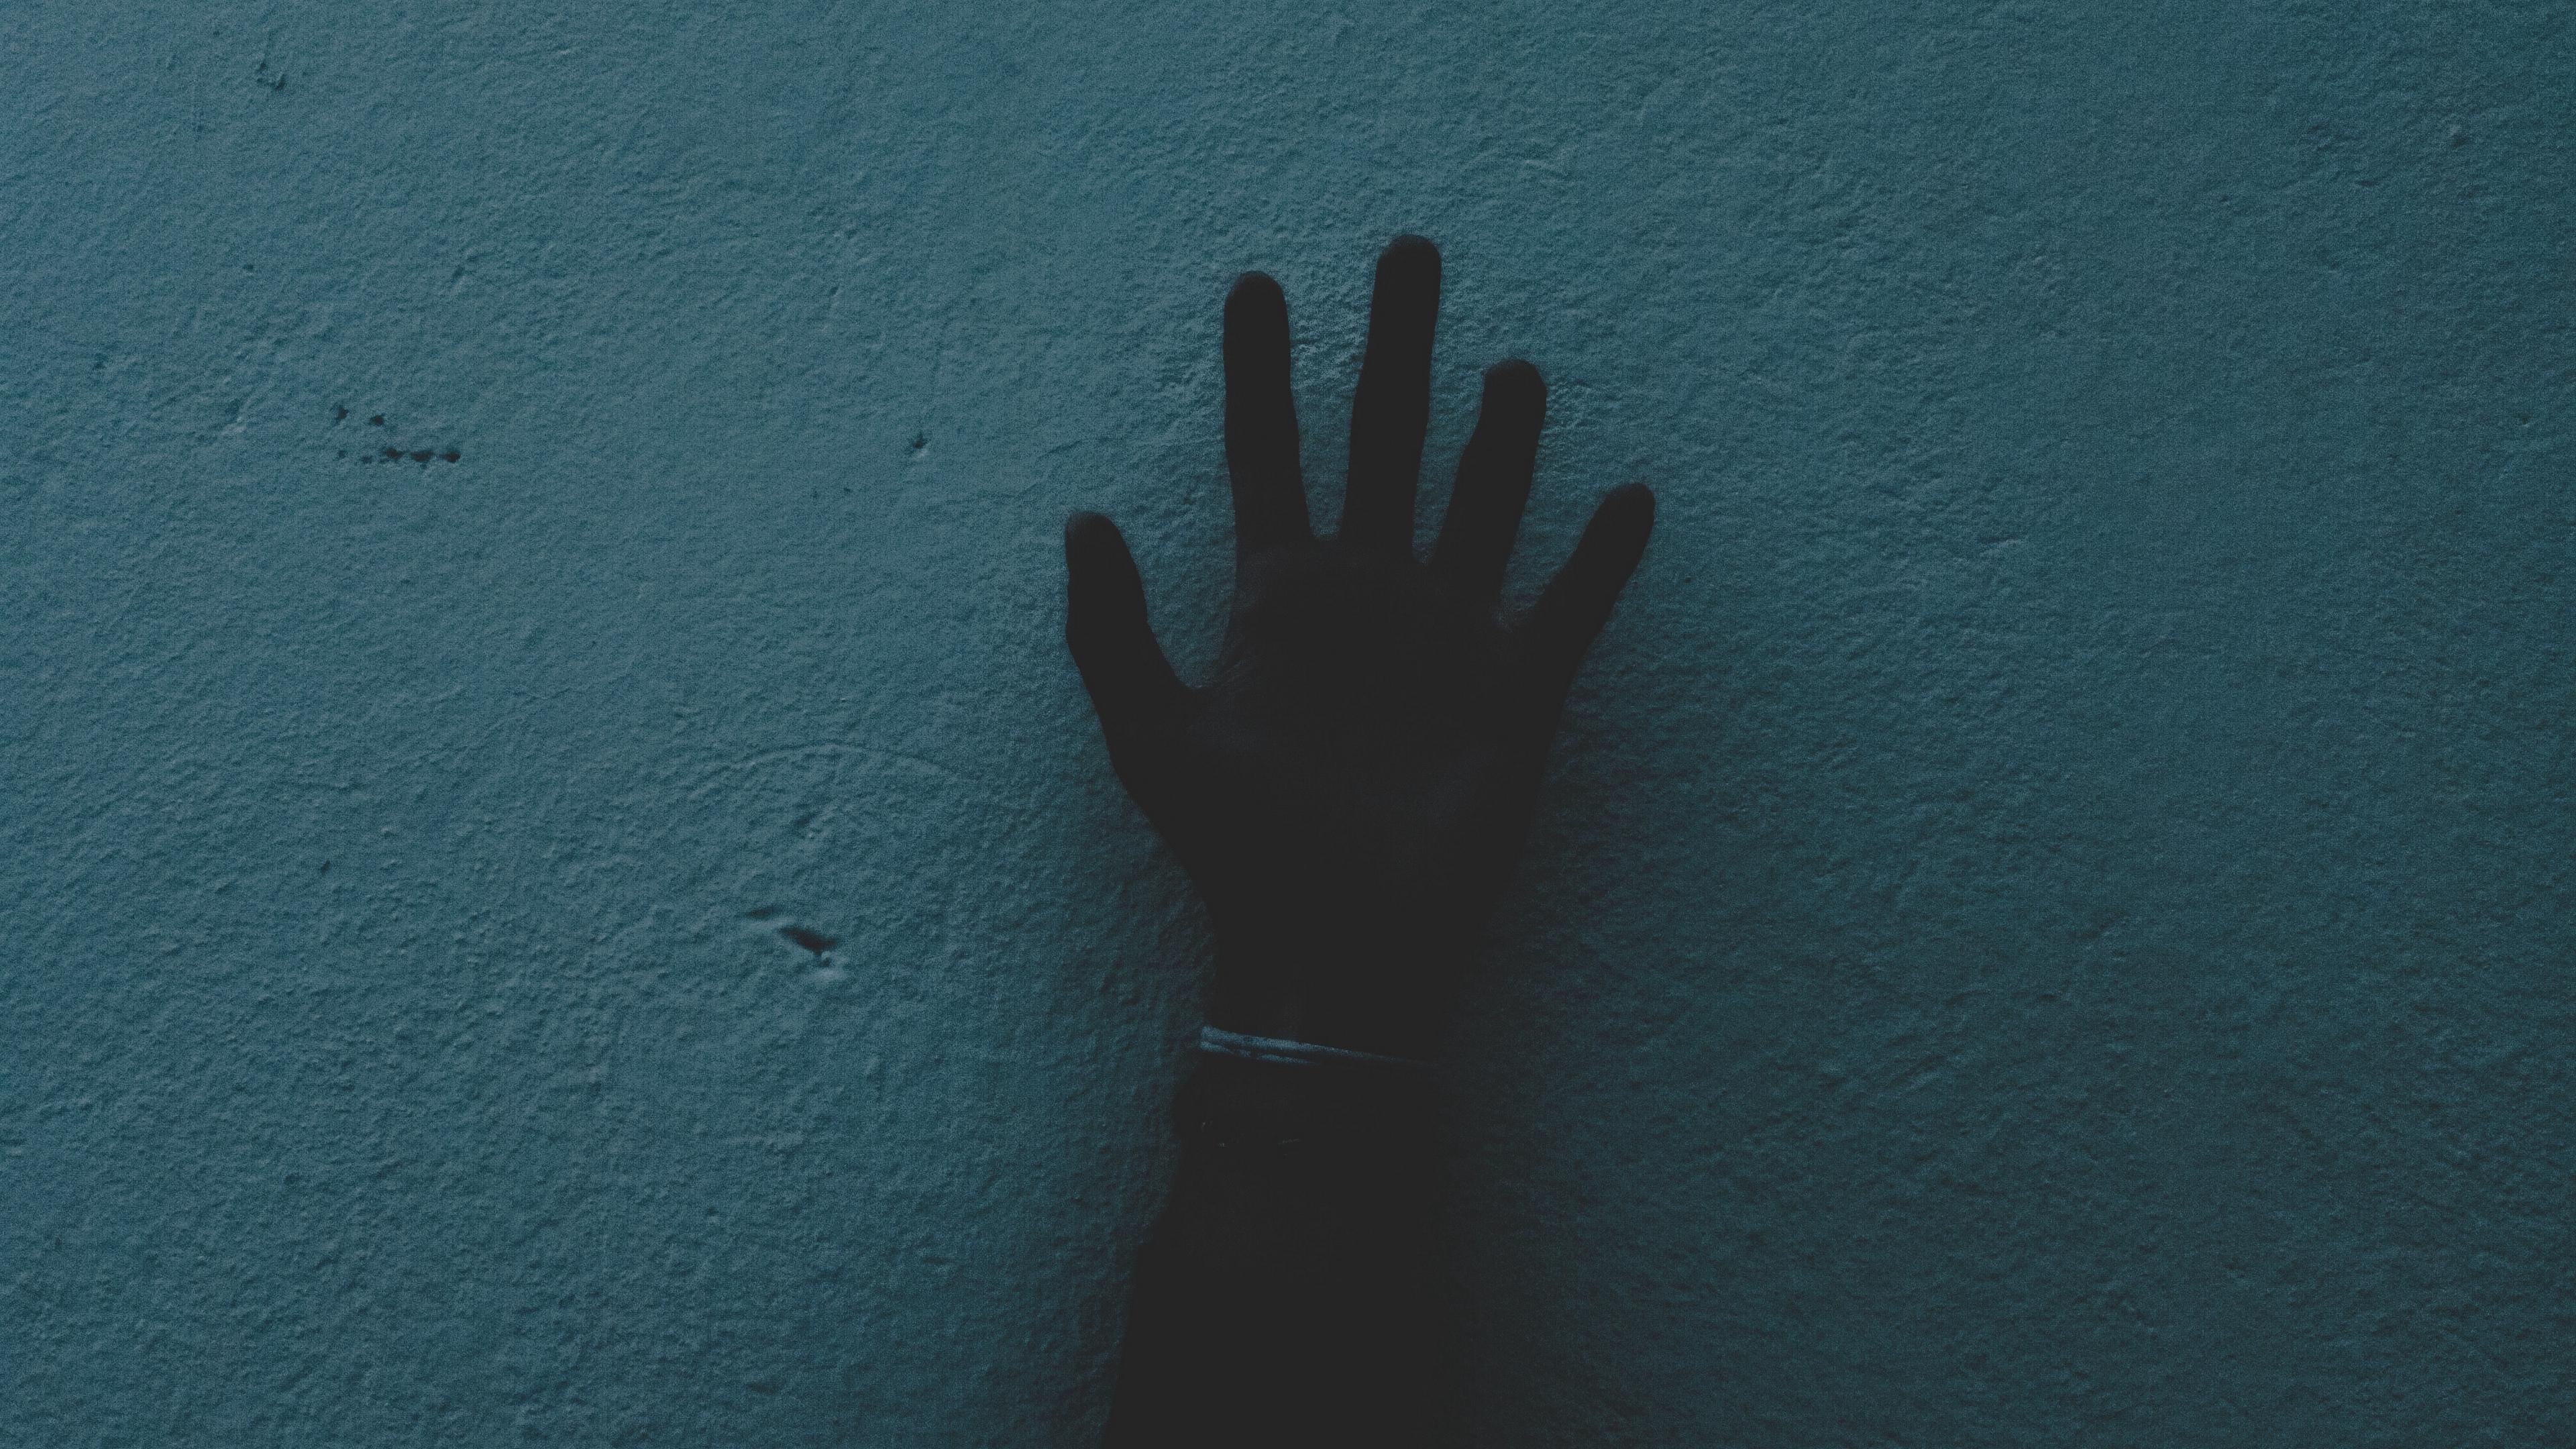 hand wall dark 4k 1540575273 - hand, wall, dark 4k - WALL, hand, Dark